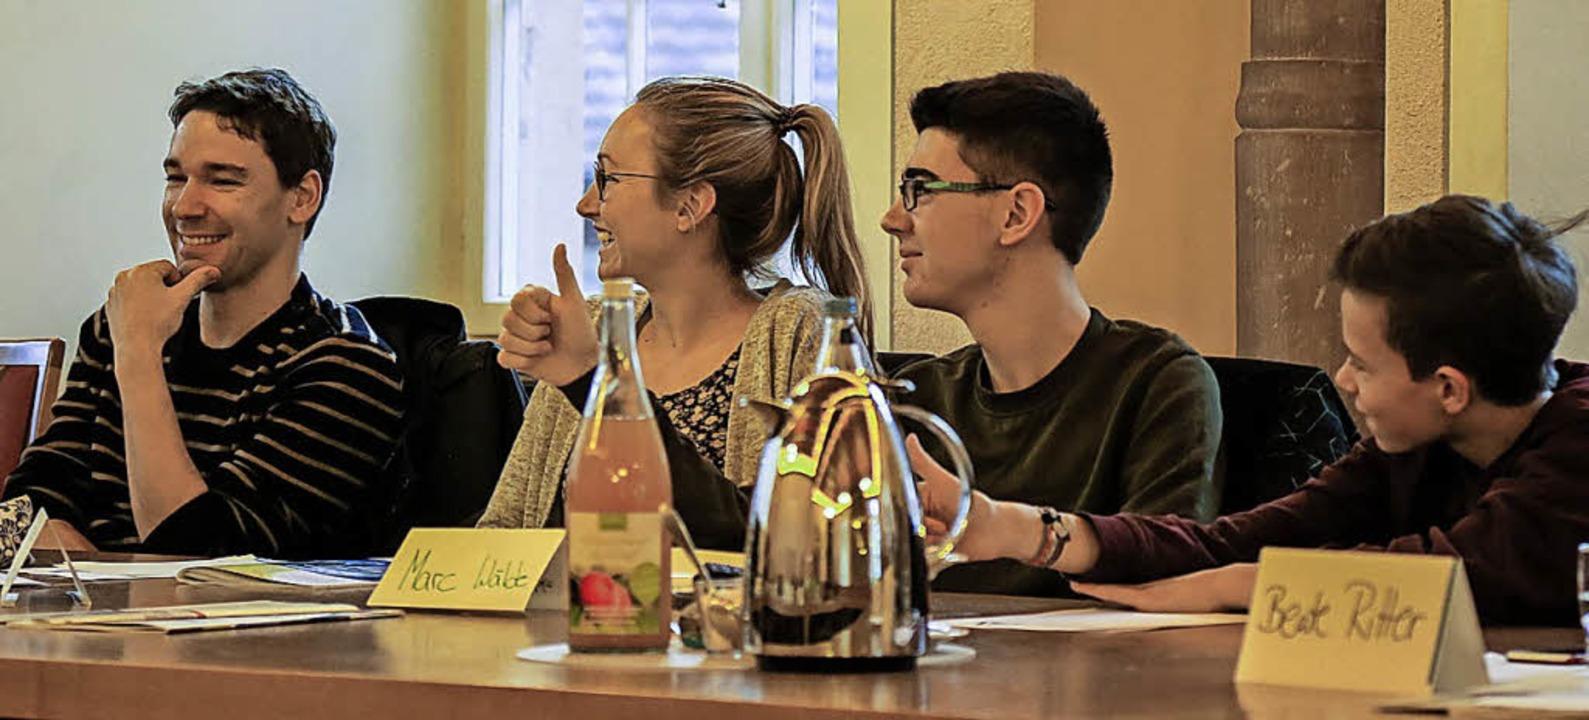 <ppp>Schülerinnen und Schüler diskutieren.</ppp>    Foto: Sandra Decoux-Kone